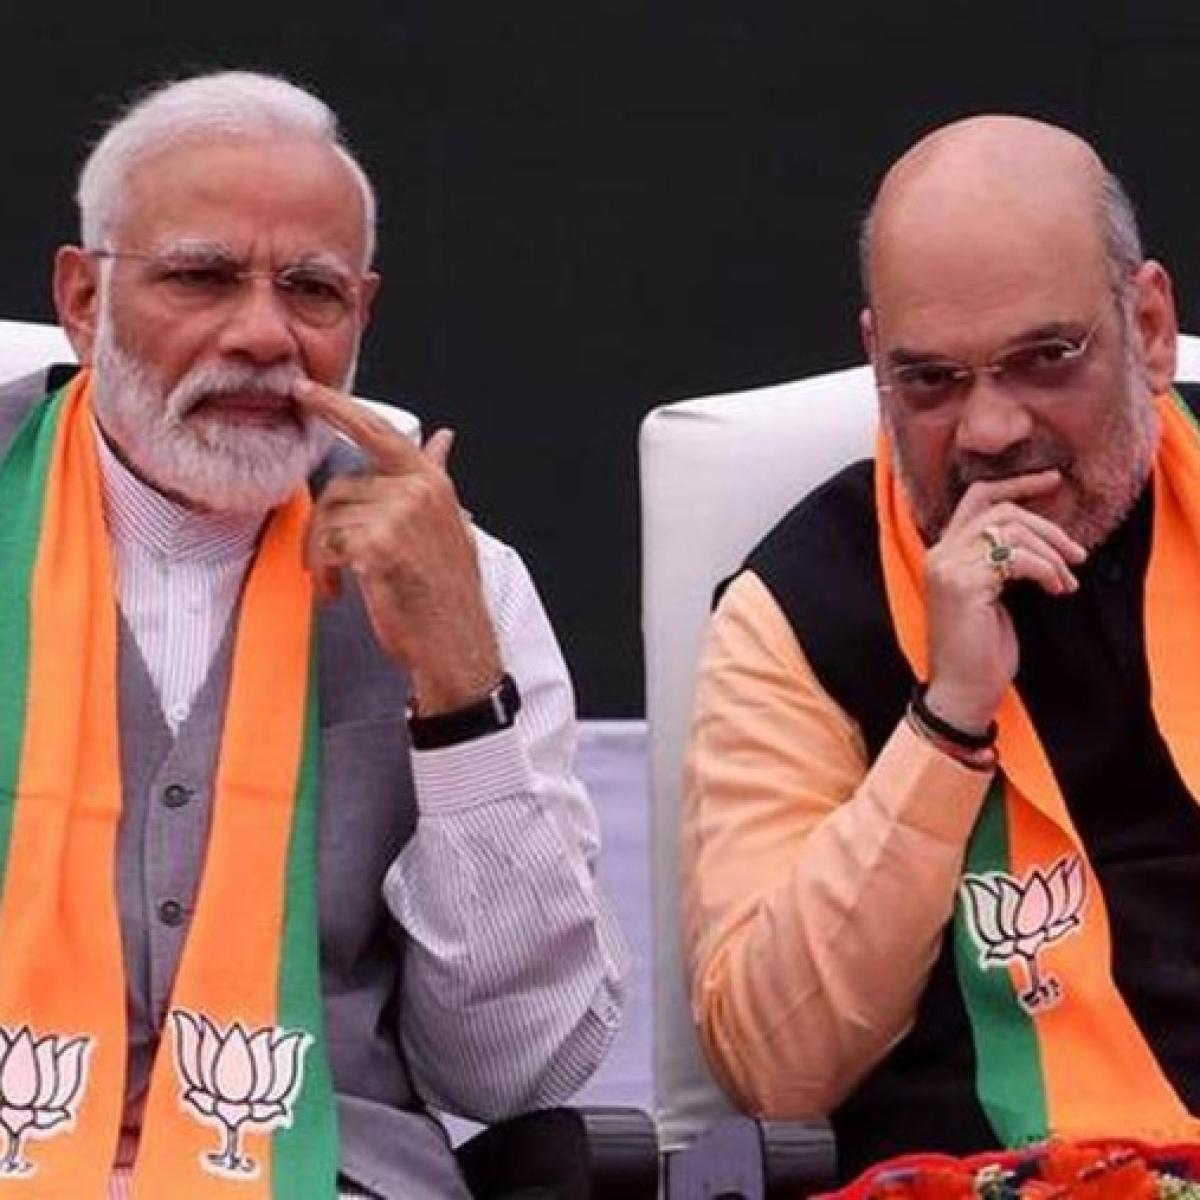 GDP growth falls to 4.5%: BJP allies worried as economic slowdown takes off Modi's shine